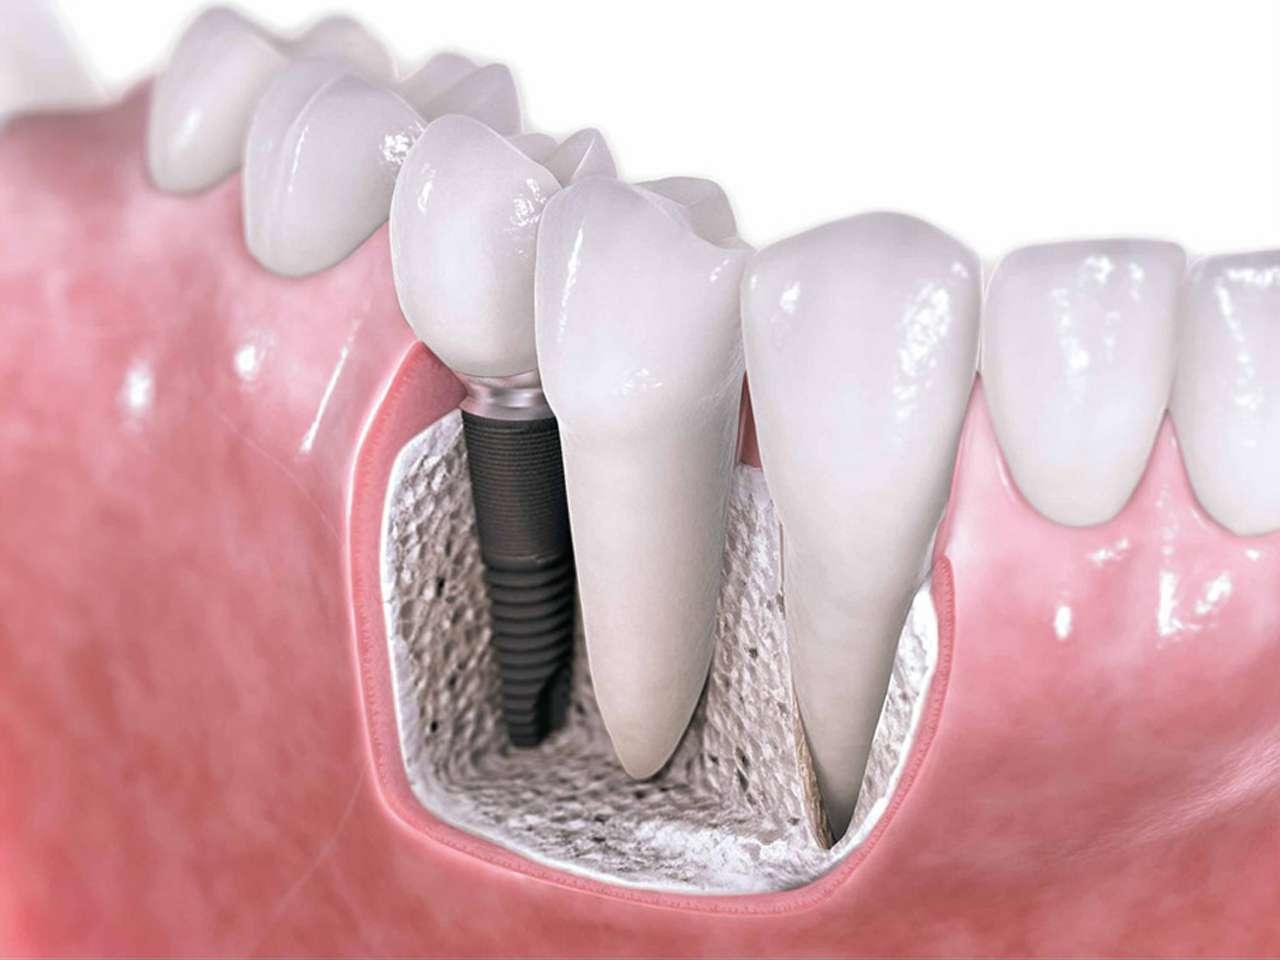 Implantes dentales de la UABC Foto: Agencia ID